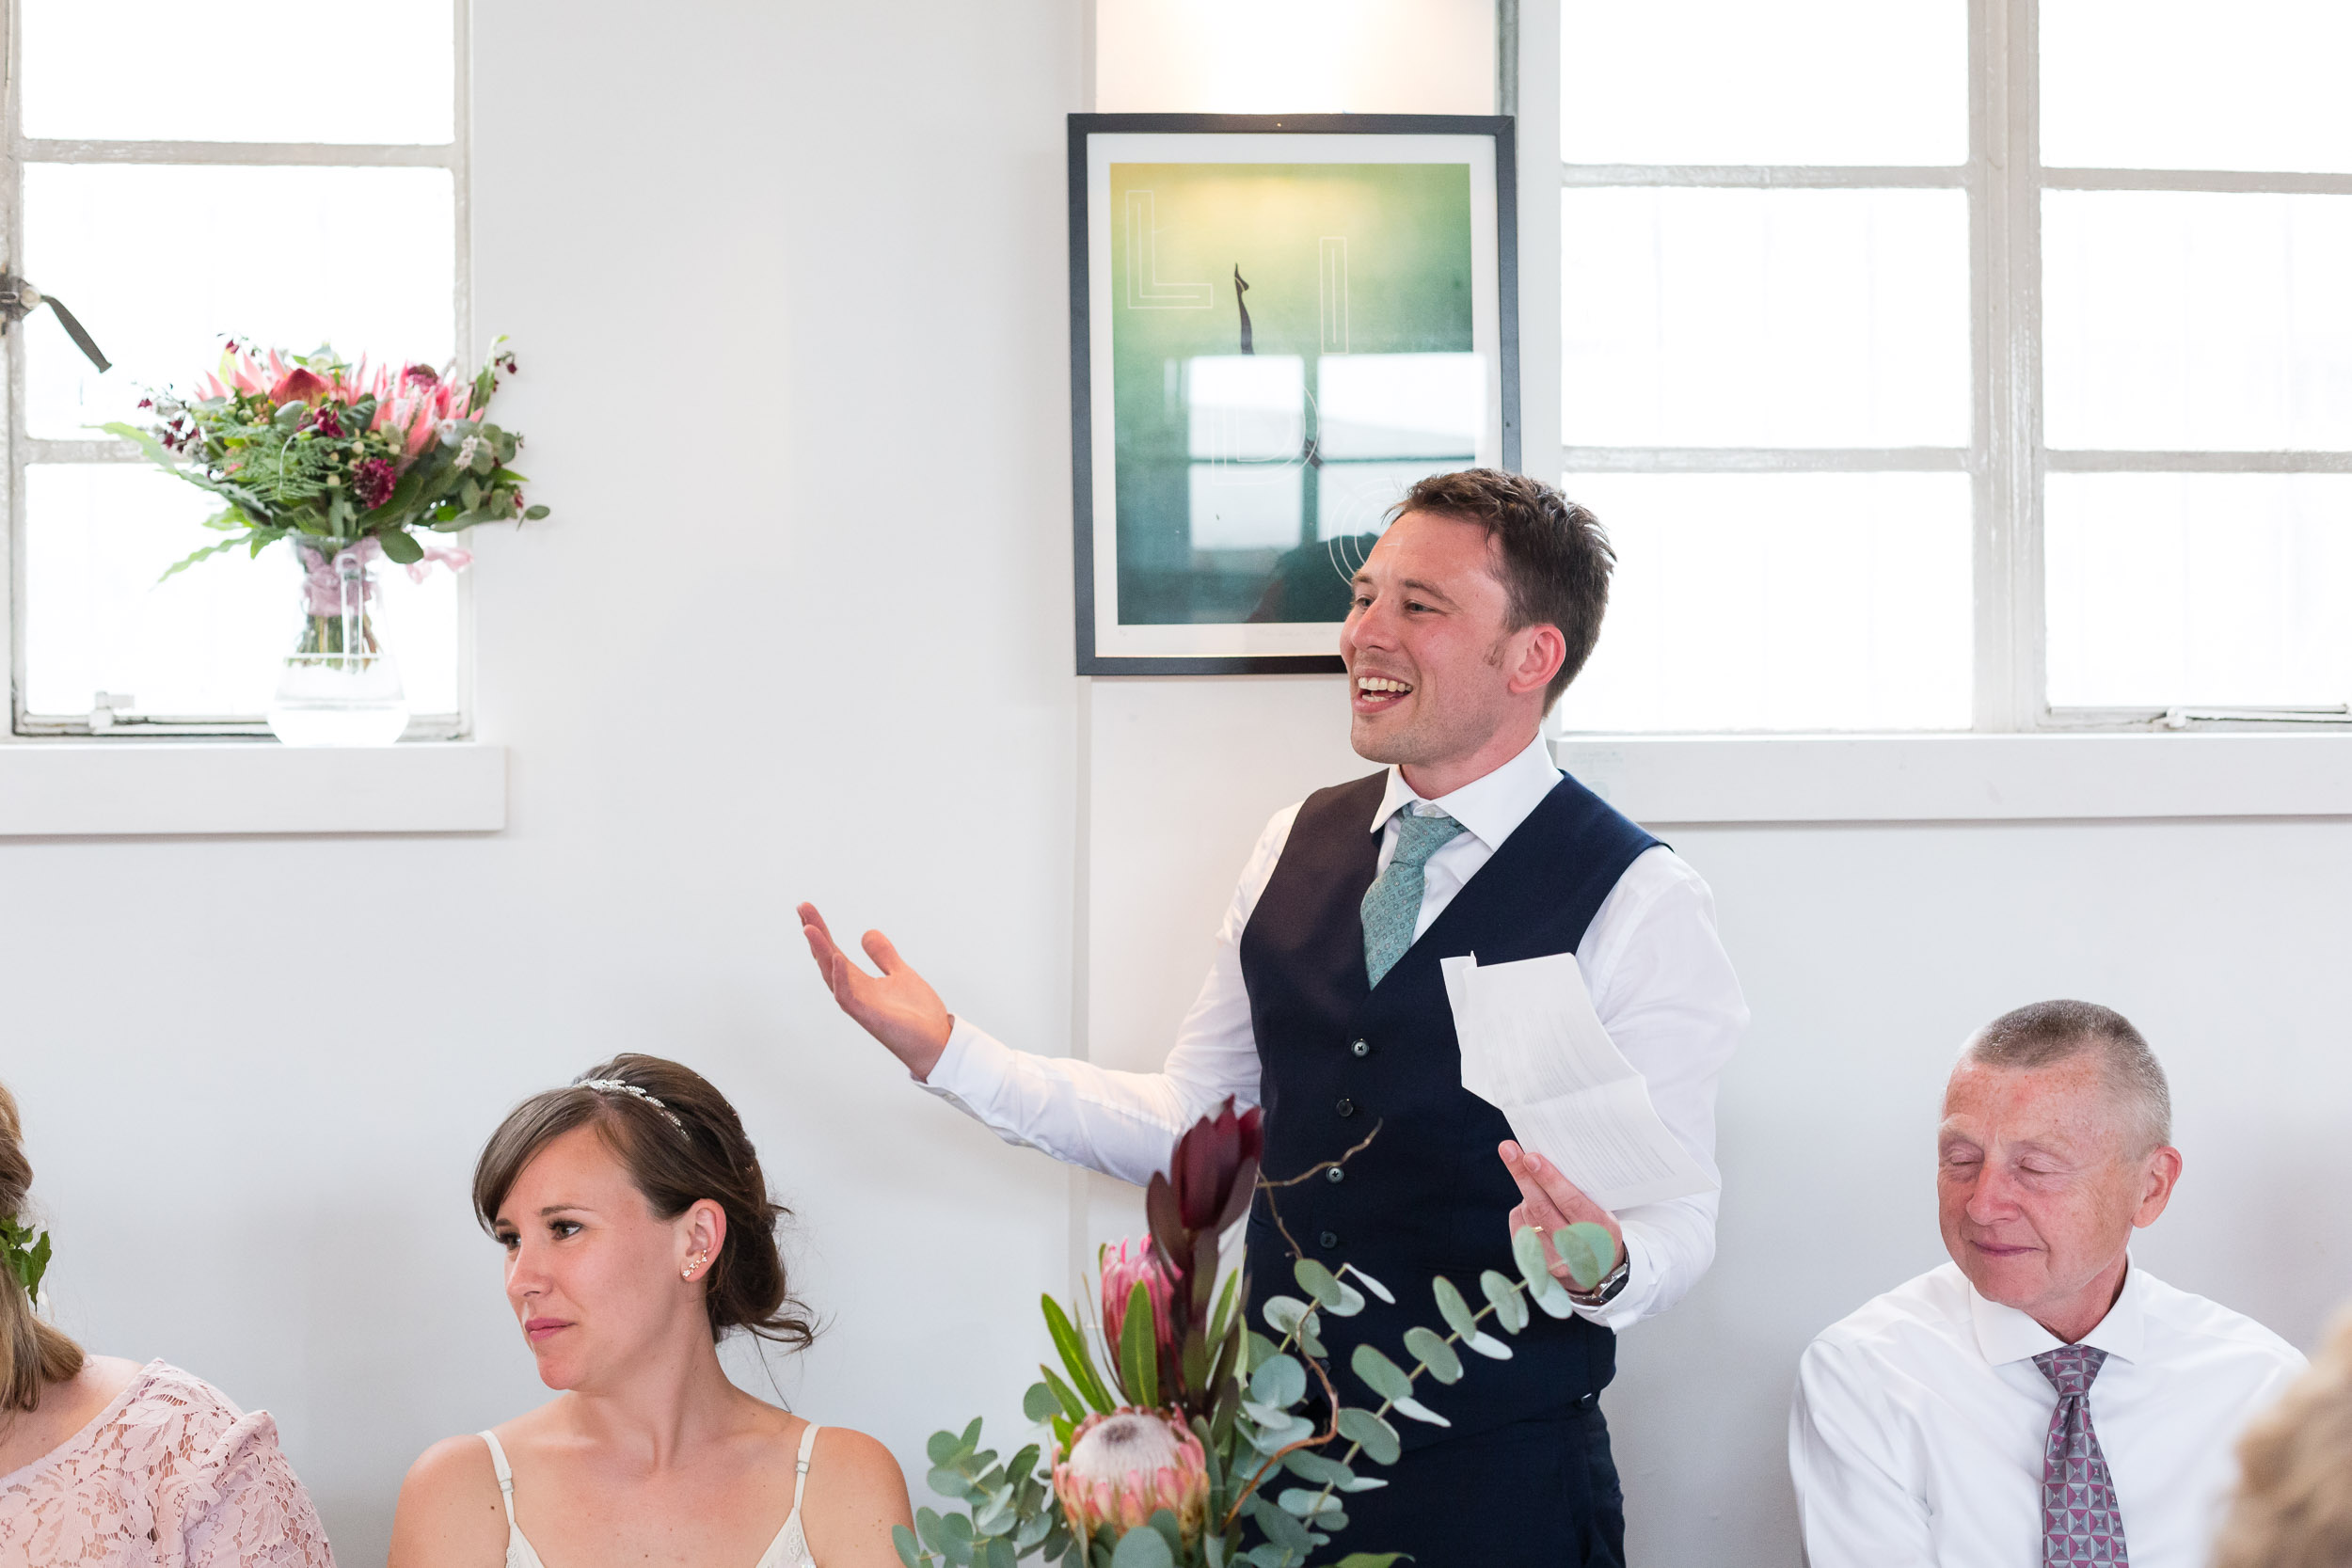 brockwell-lido-brixton-herne-hill-wedding-346.jpg